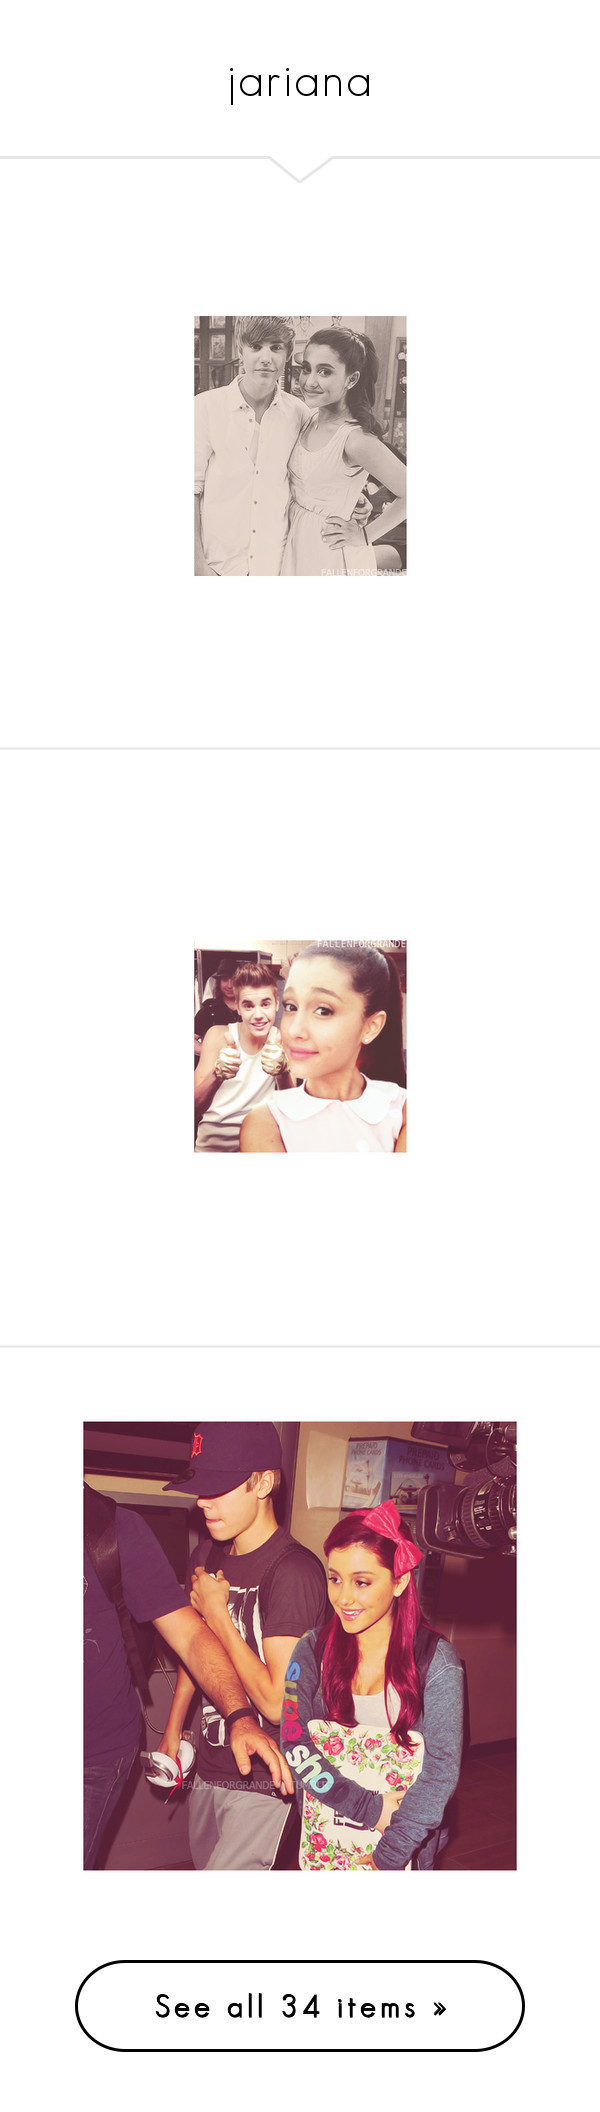 Ariana grande pink dress jimmy  jariana